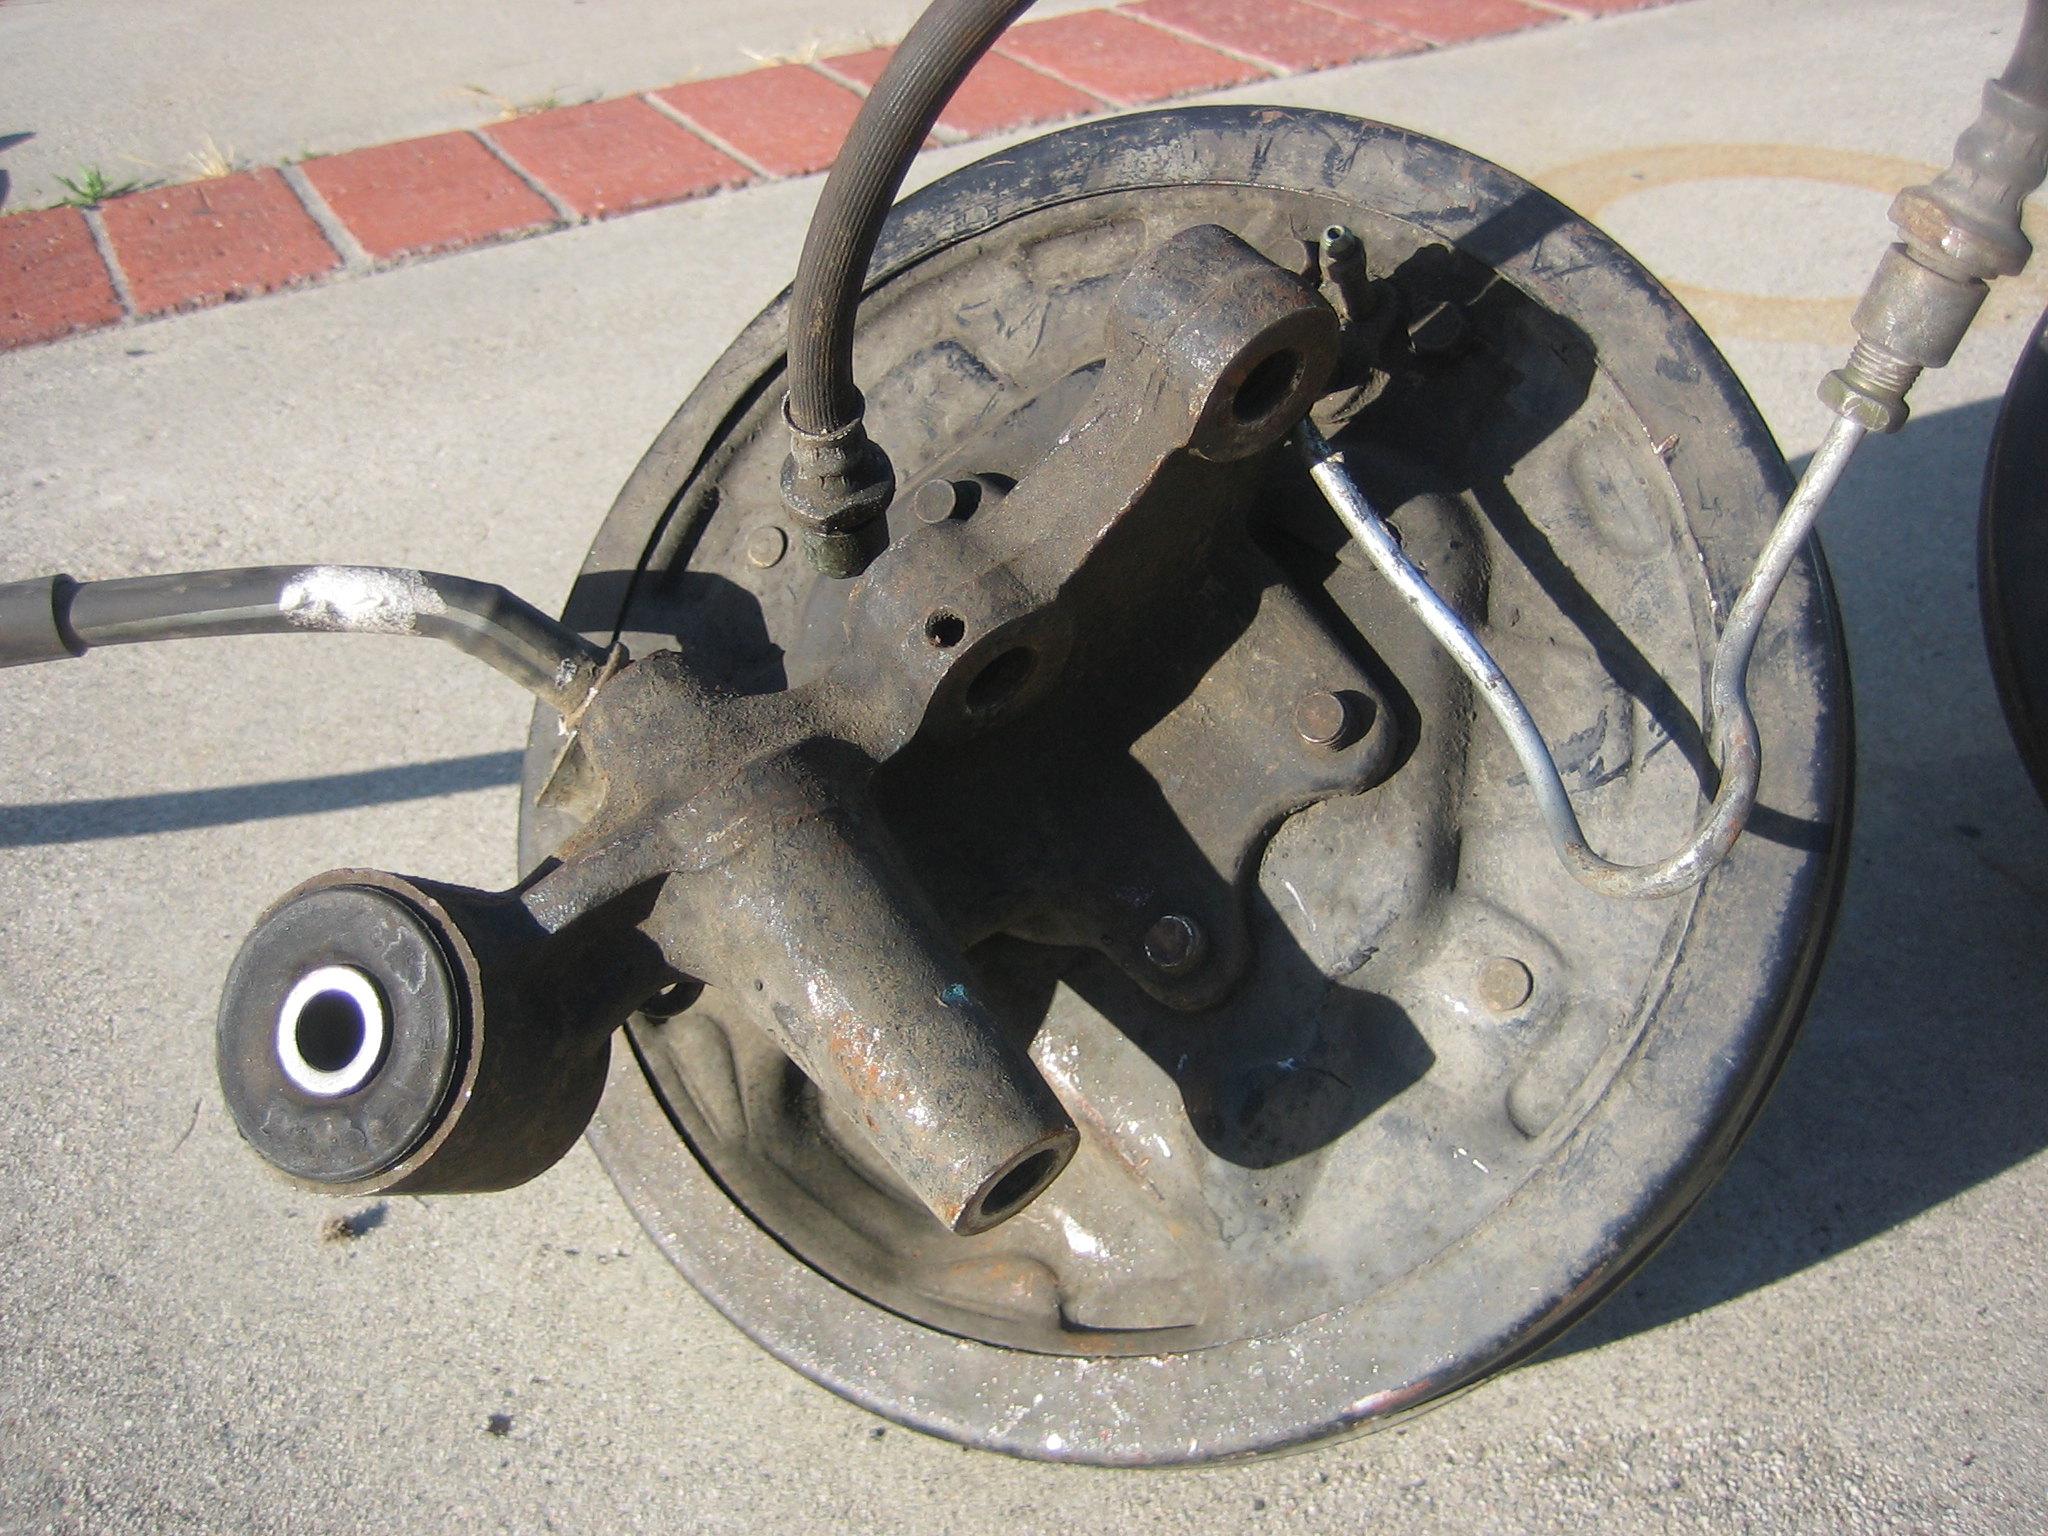 93-95 Impreza Front Wheel Drive (FWD) Parts - i-Club